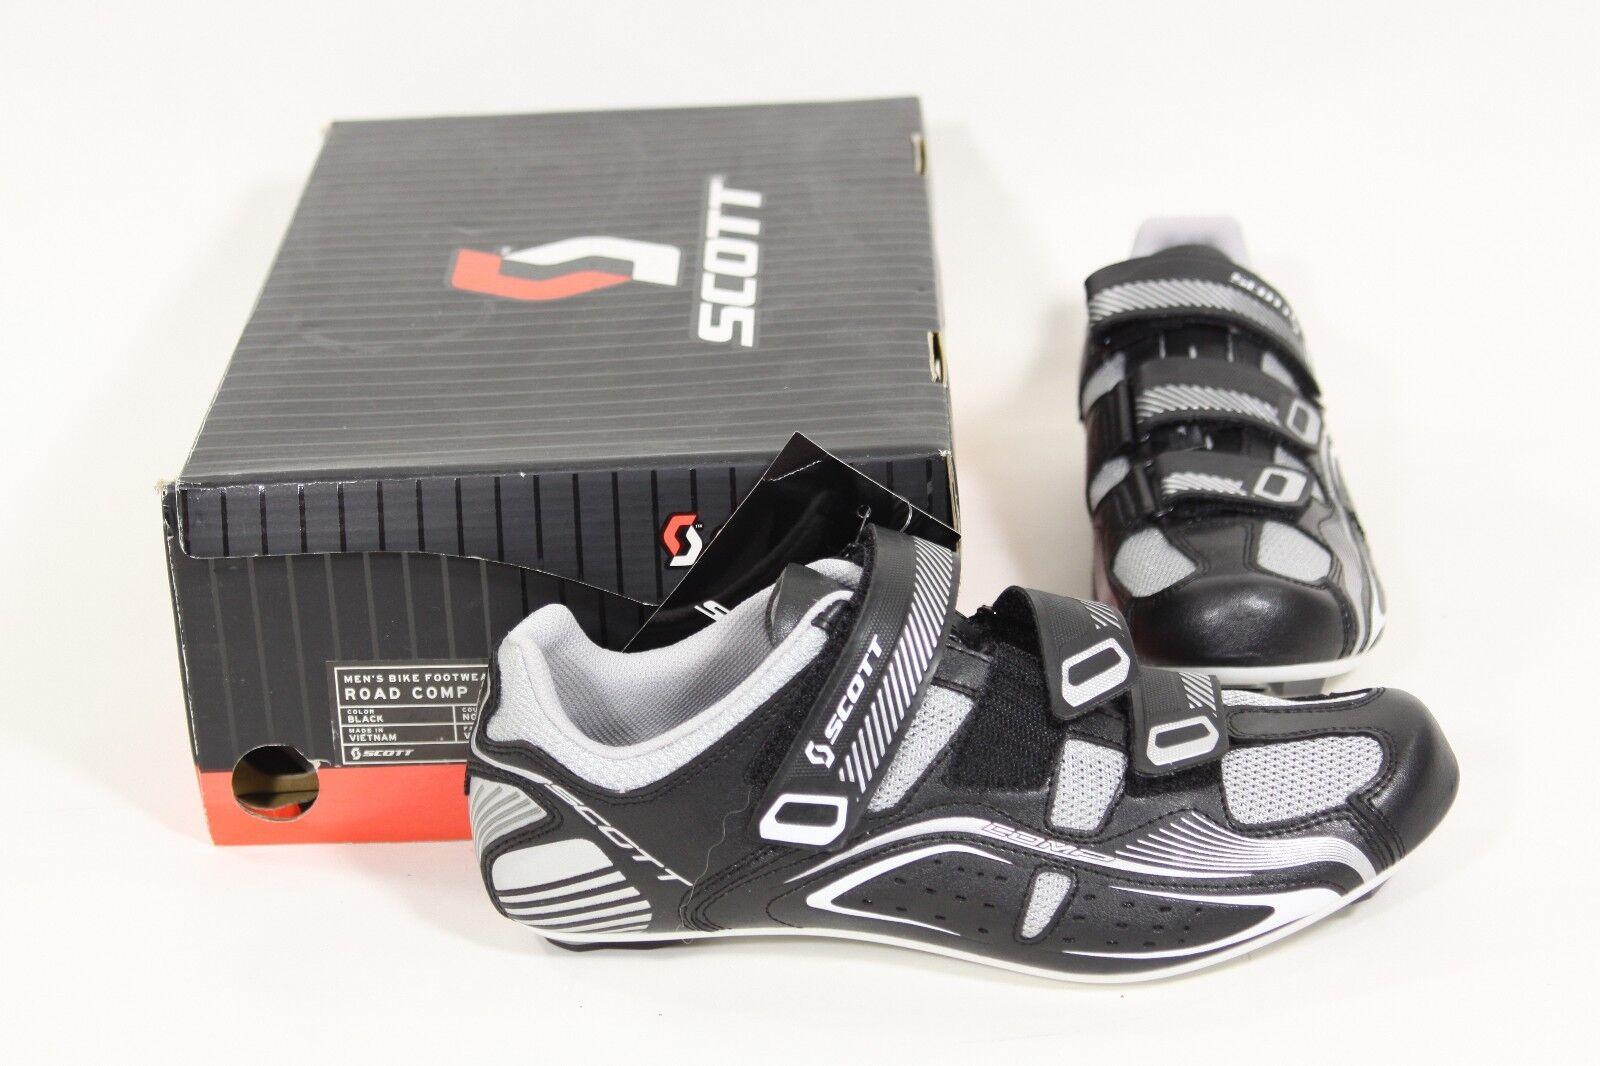 Scott Carretera Compuesta Hombre Bicicleta Zapatos Negros Eu 43 o Us 9.5